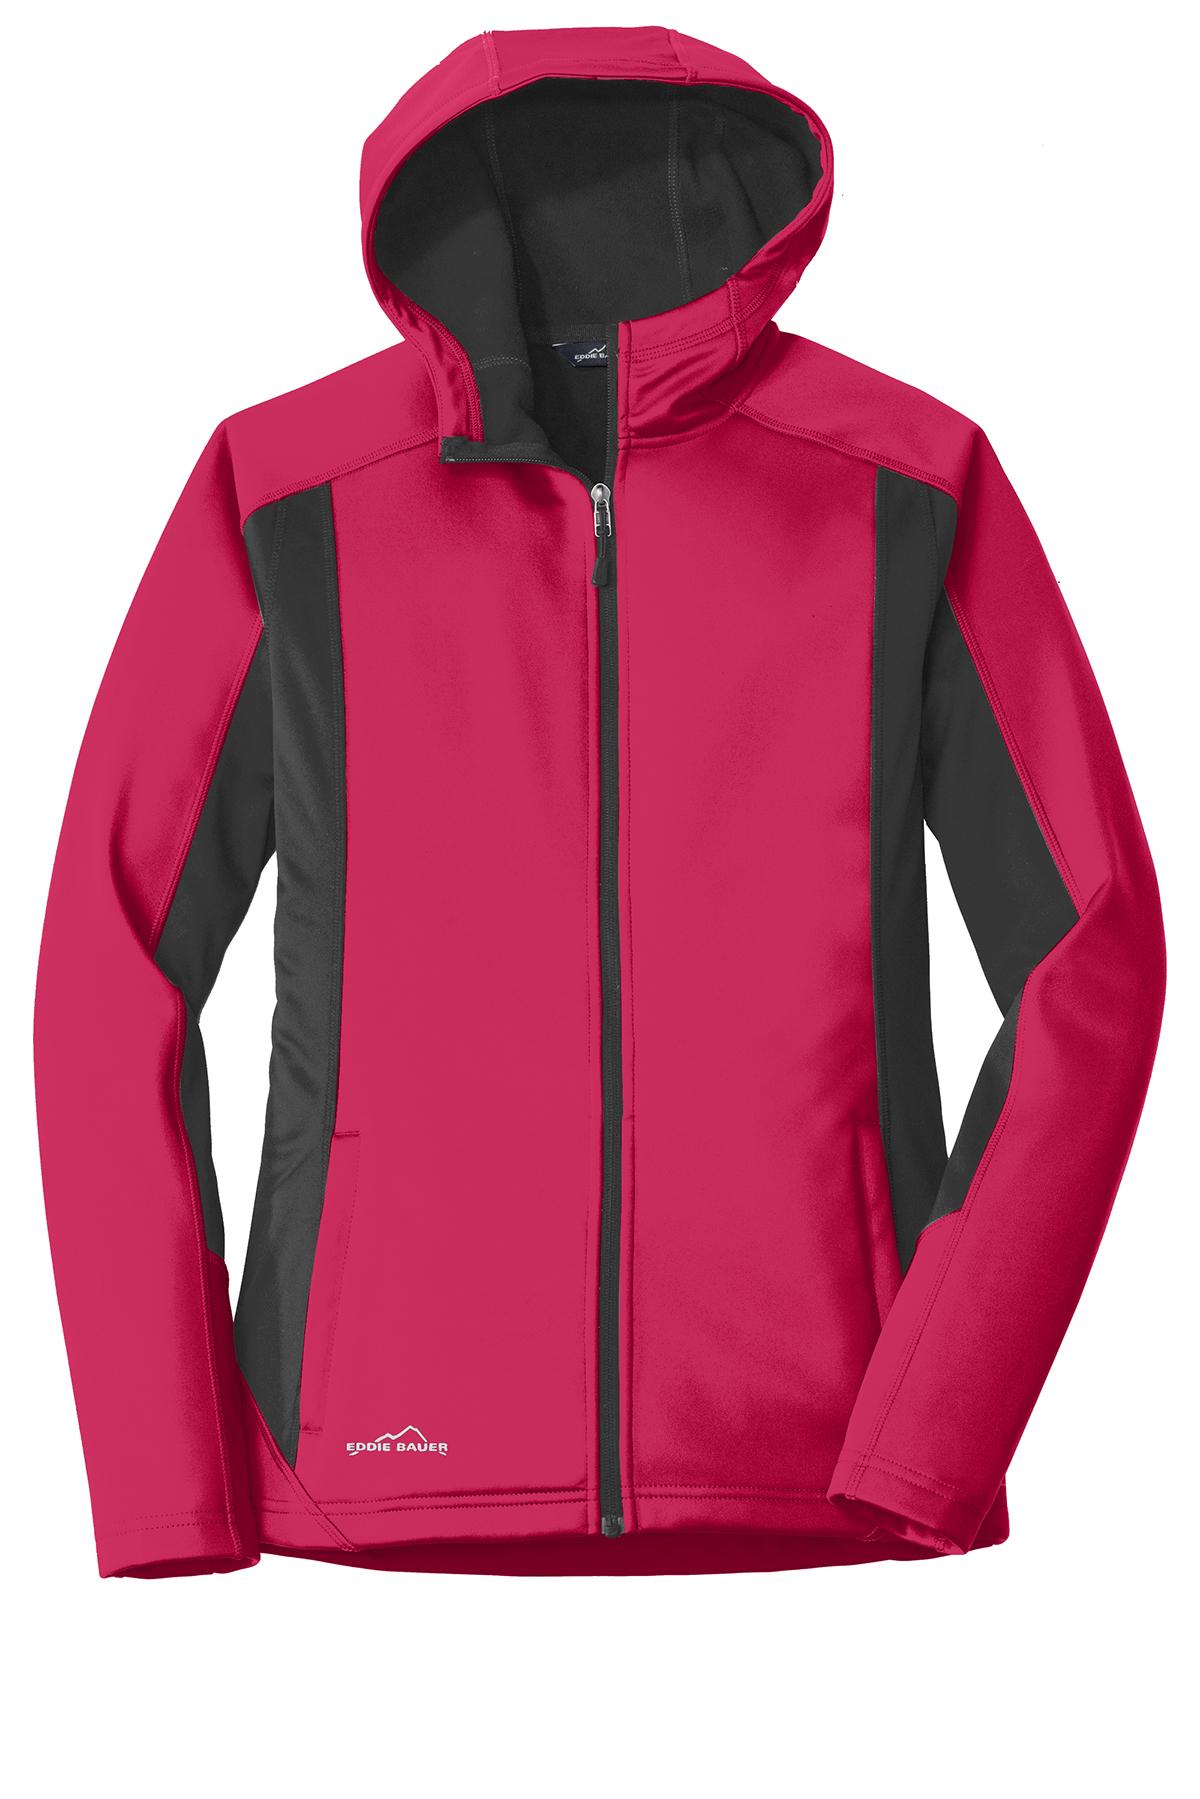 Ed Bauer La s Trail Soft Shell Jacket